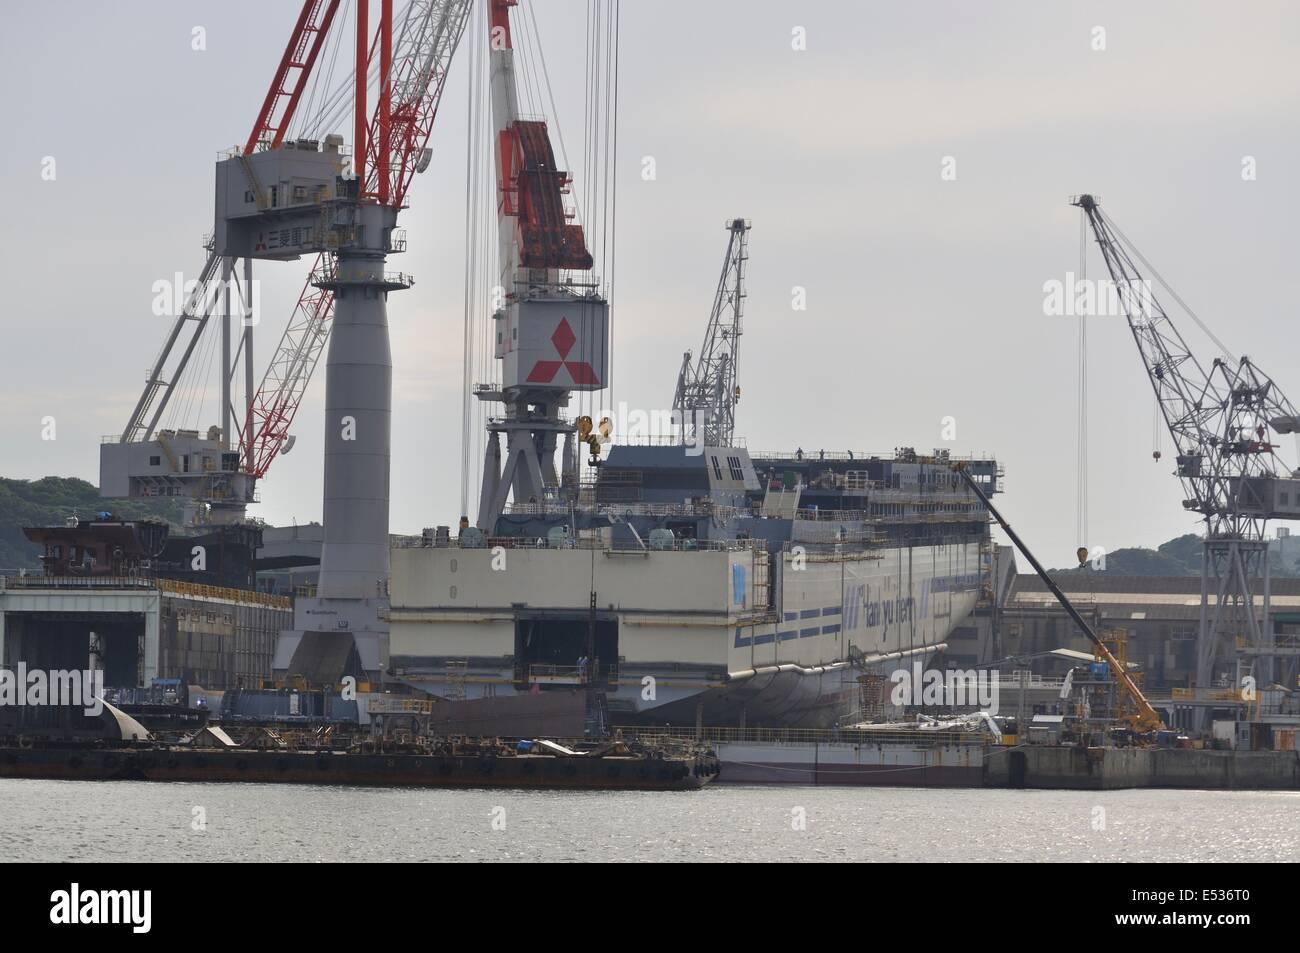 Shipyard of Mitsubishi Heavy Industries,Shimonoseki,Yamaguchi,Japan. - Stock Image